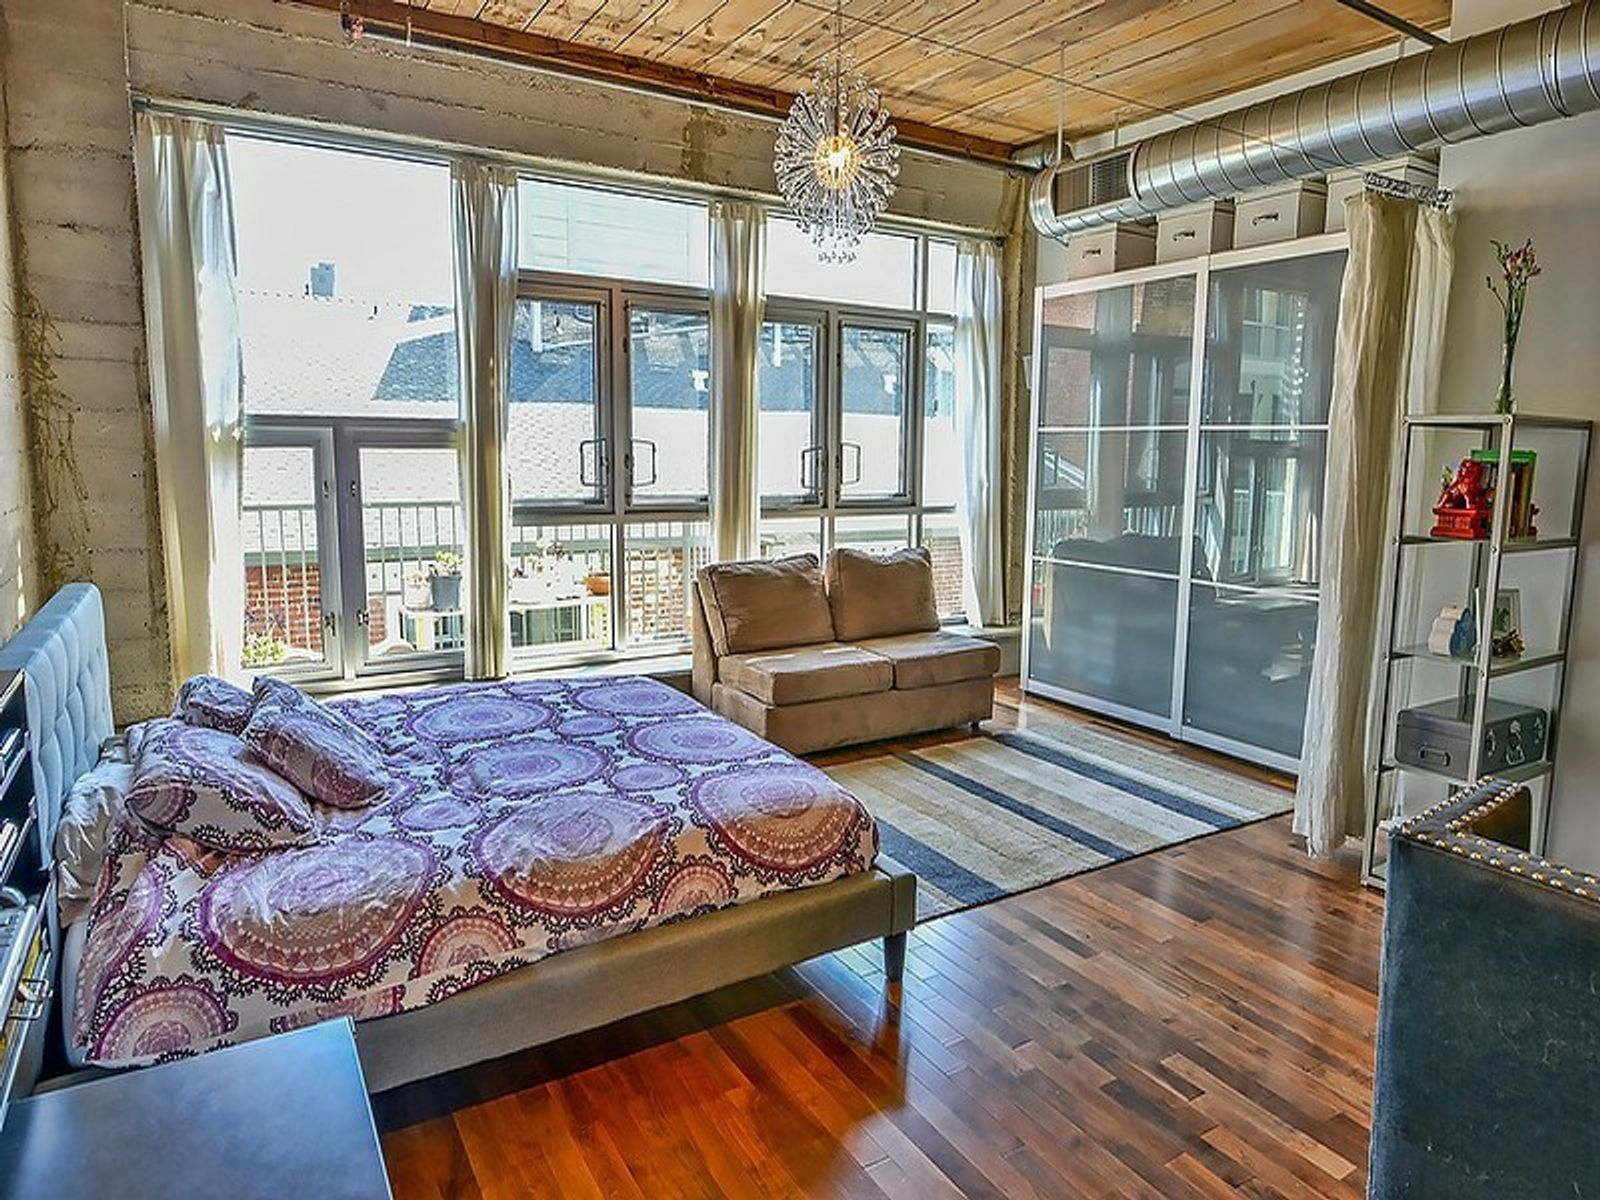 Luxury Loft with Balcony, High Ceilings